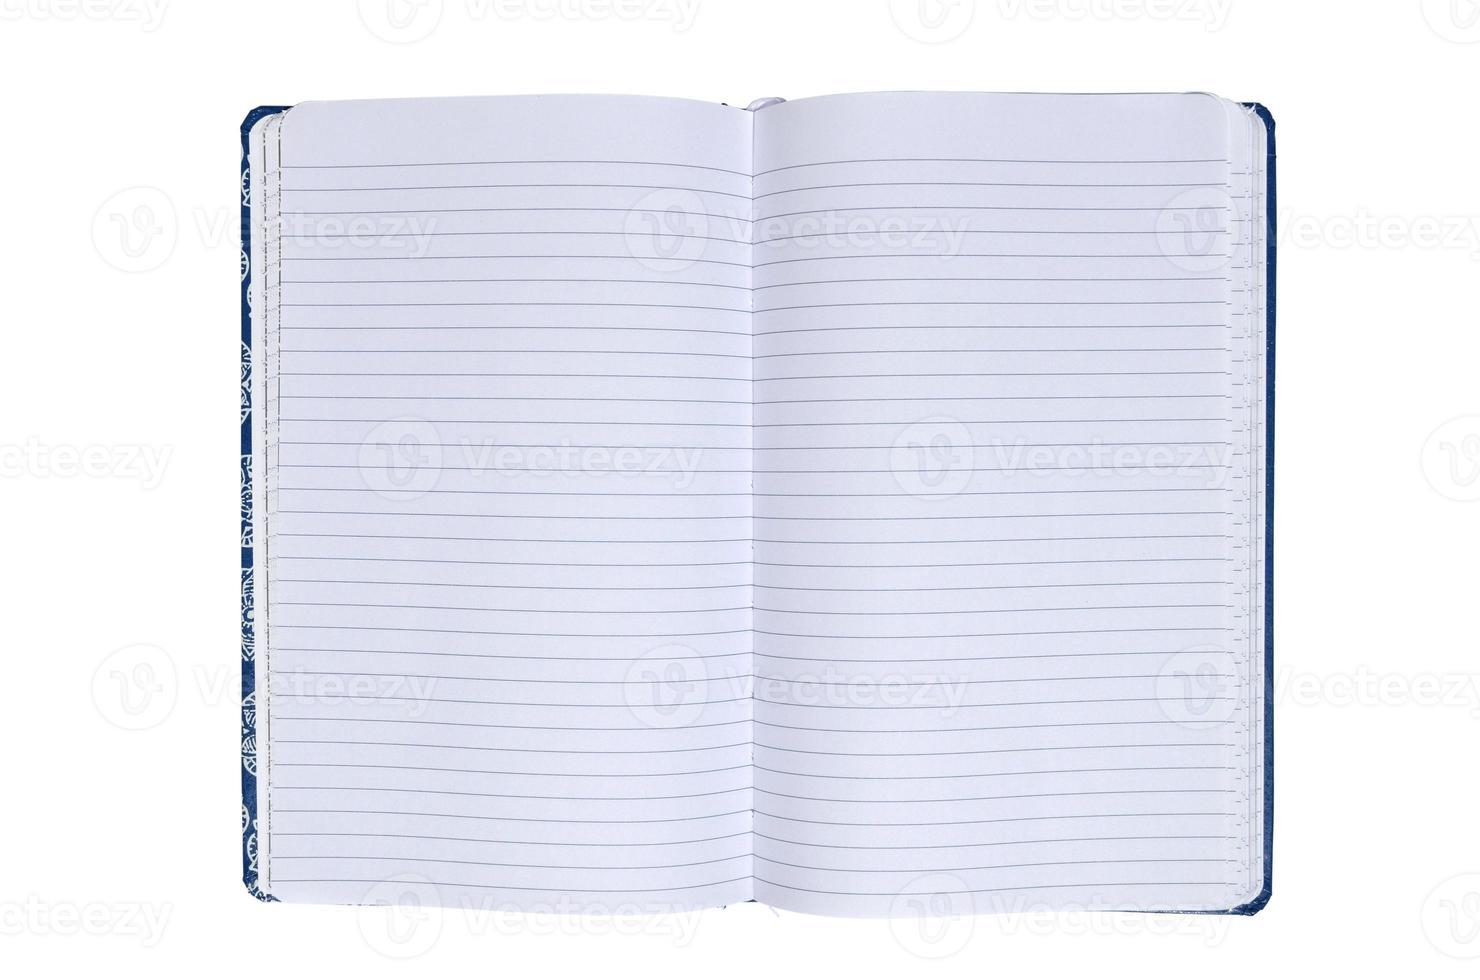 Opened notebook photo